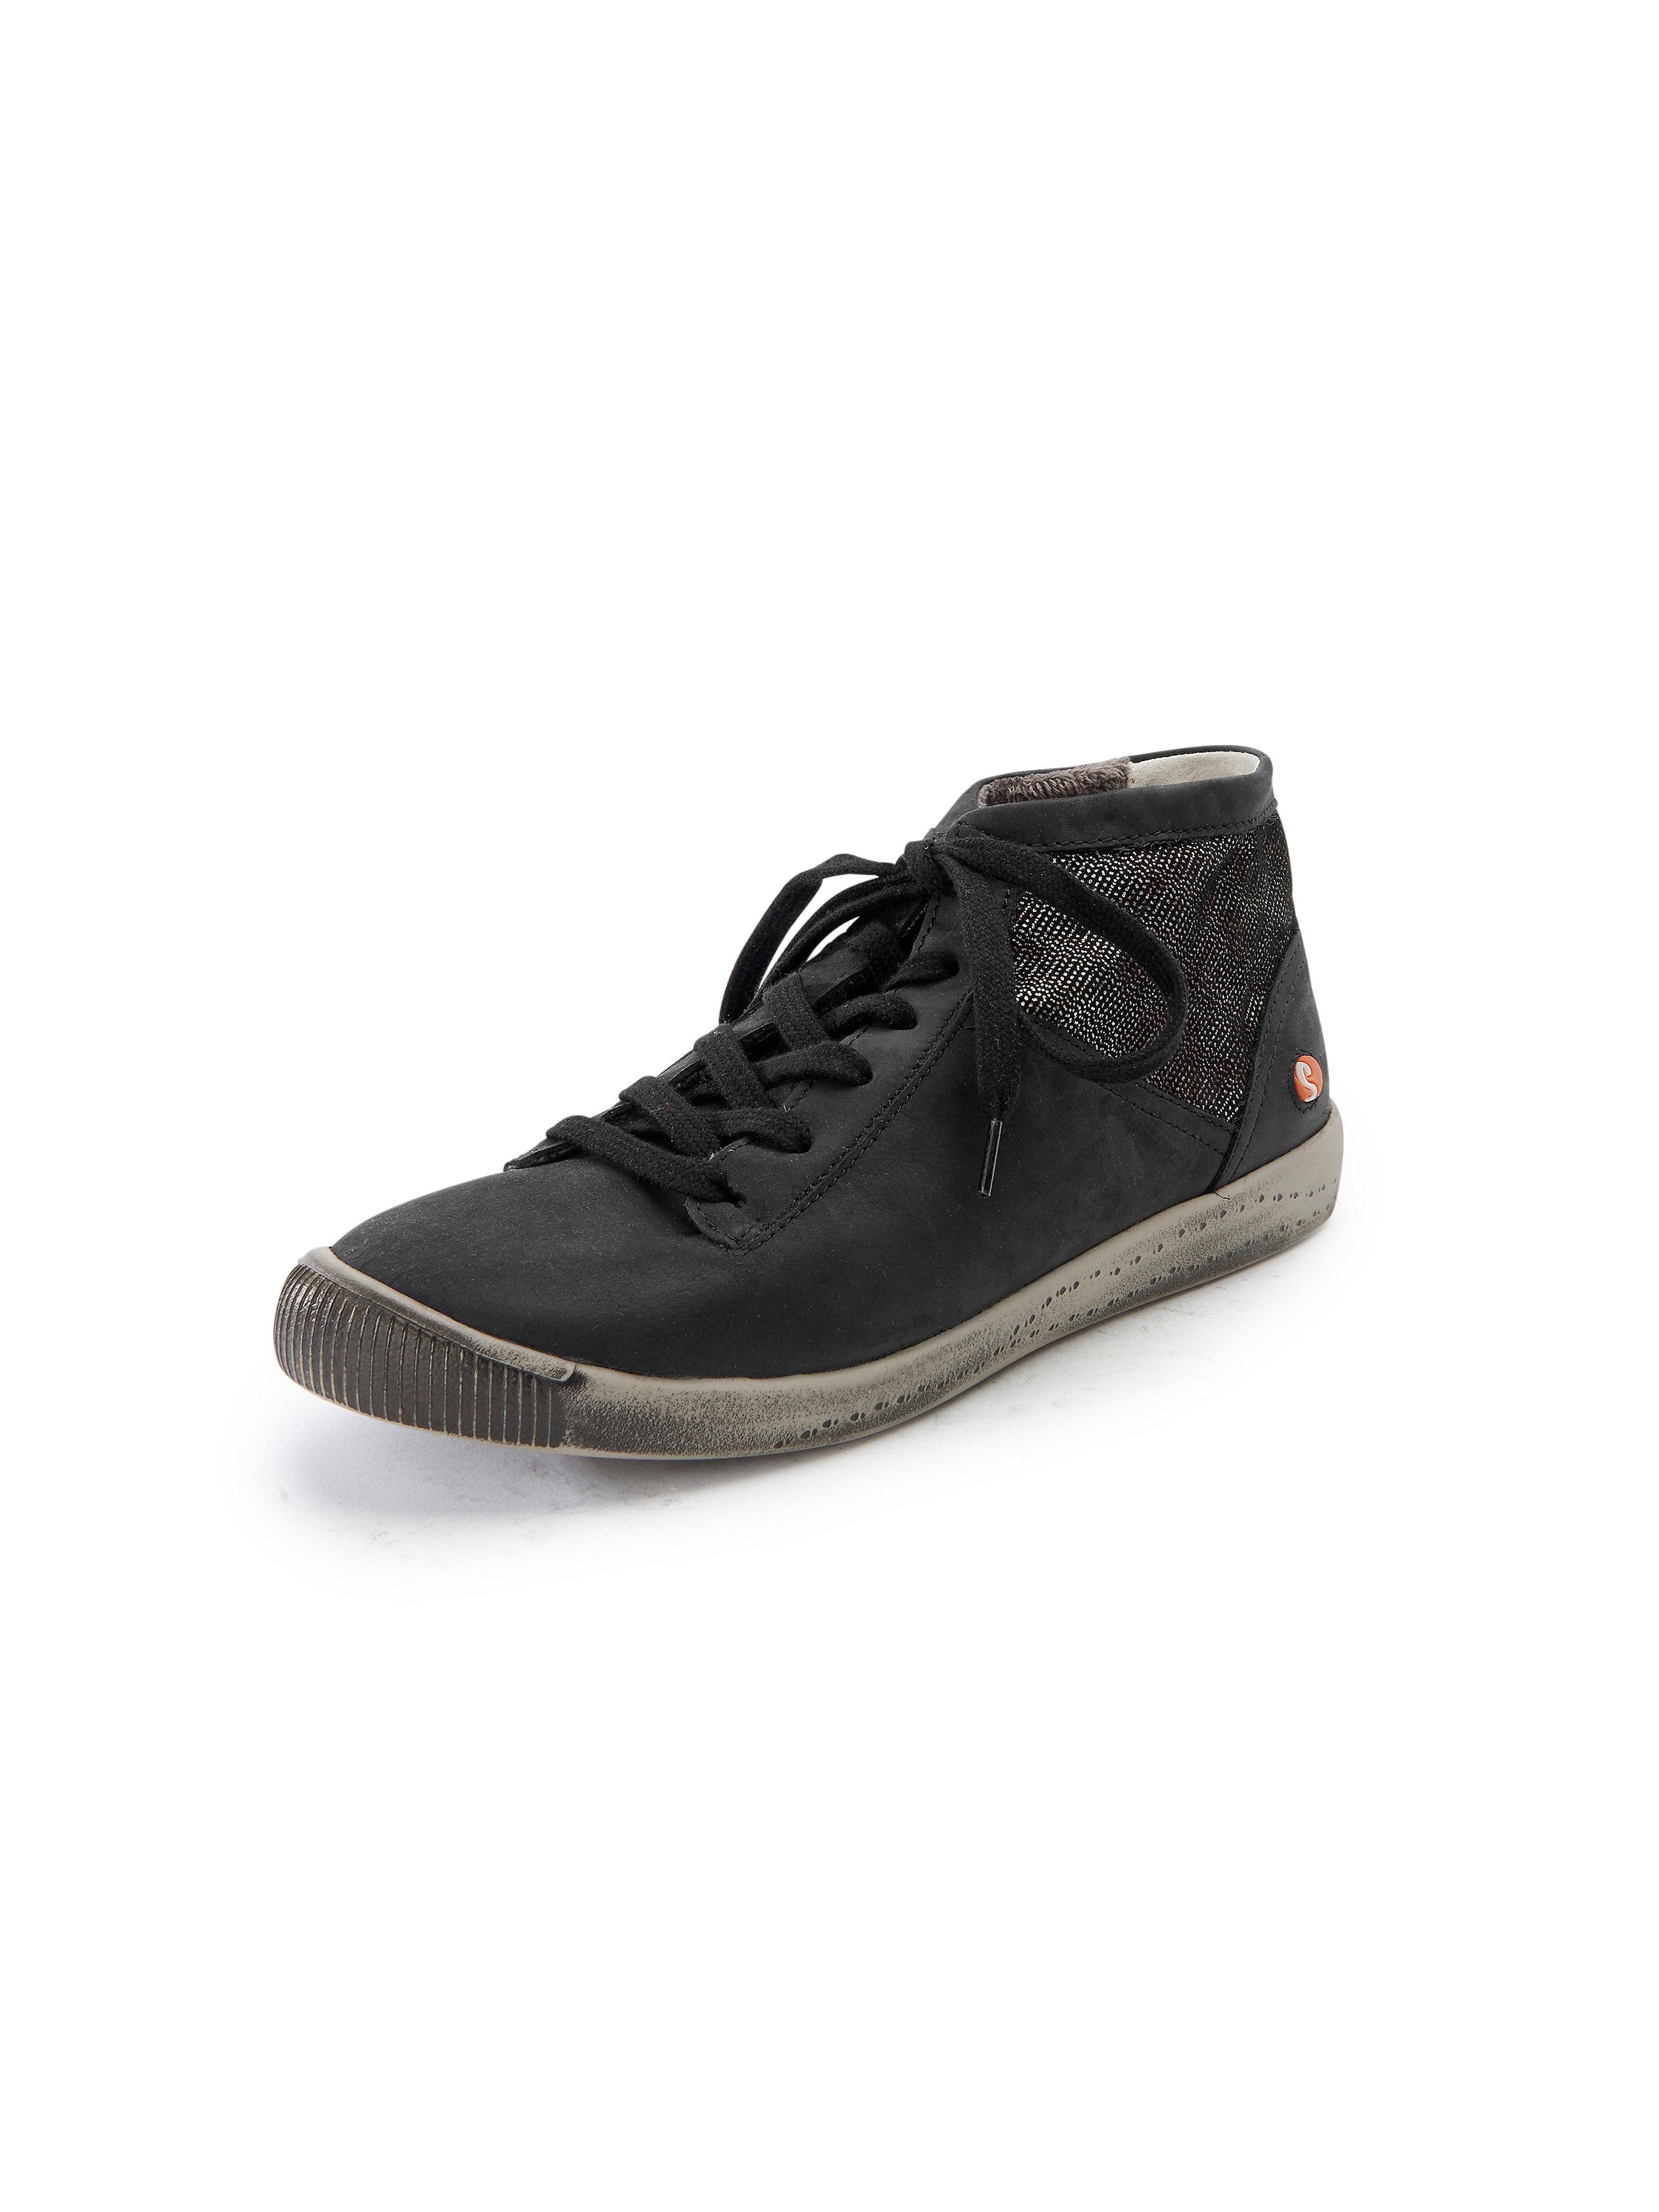 Image of   Ankelhøje sneakers Fra Softinos sort